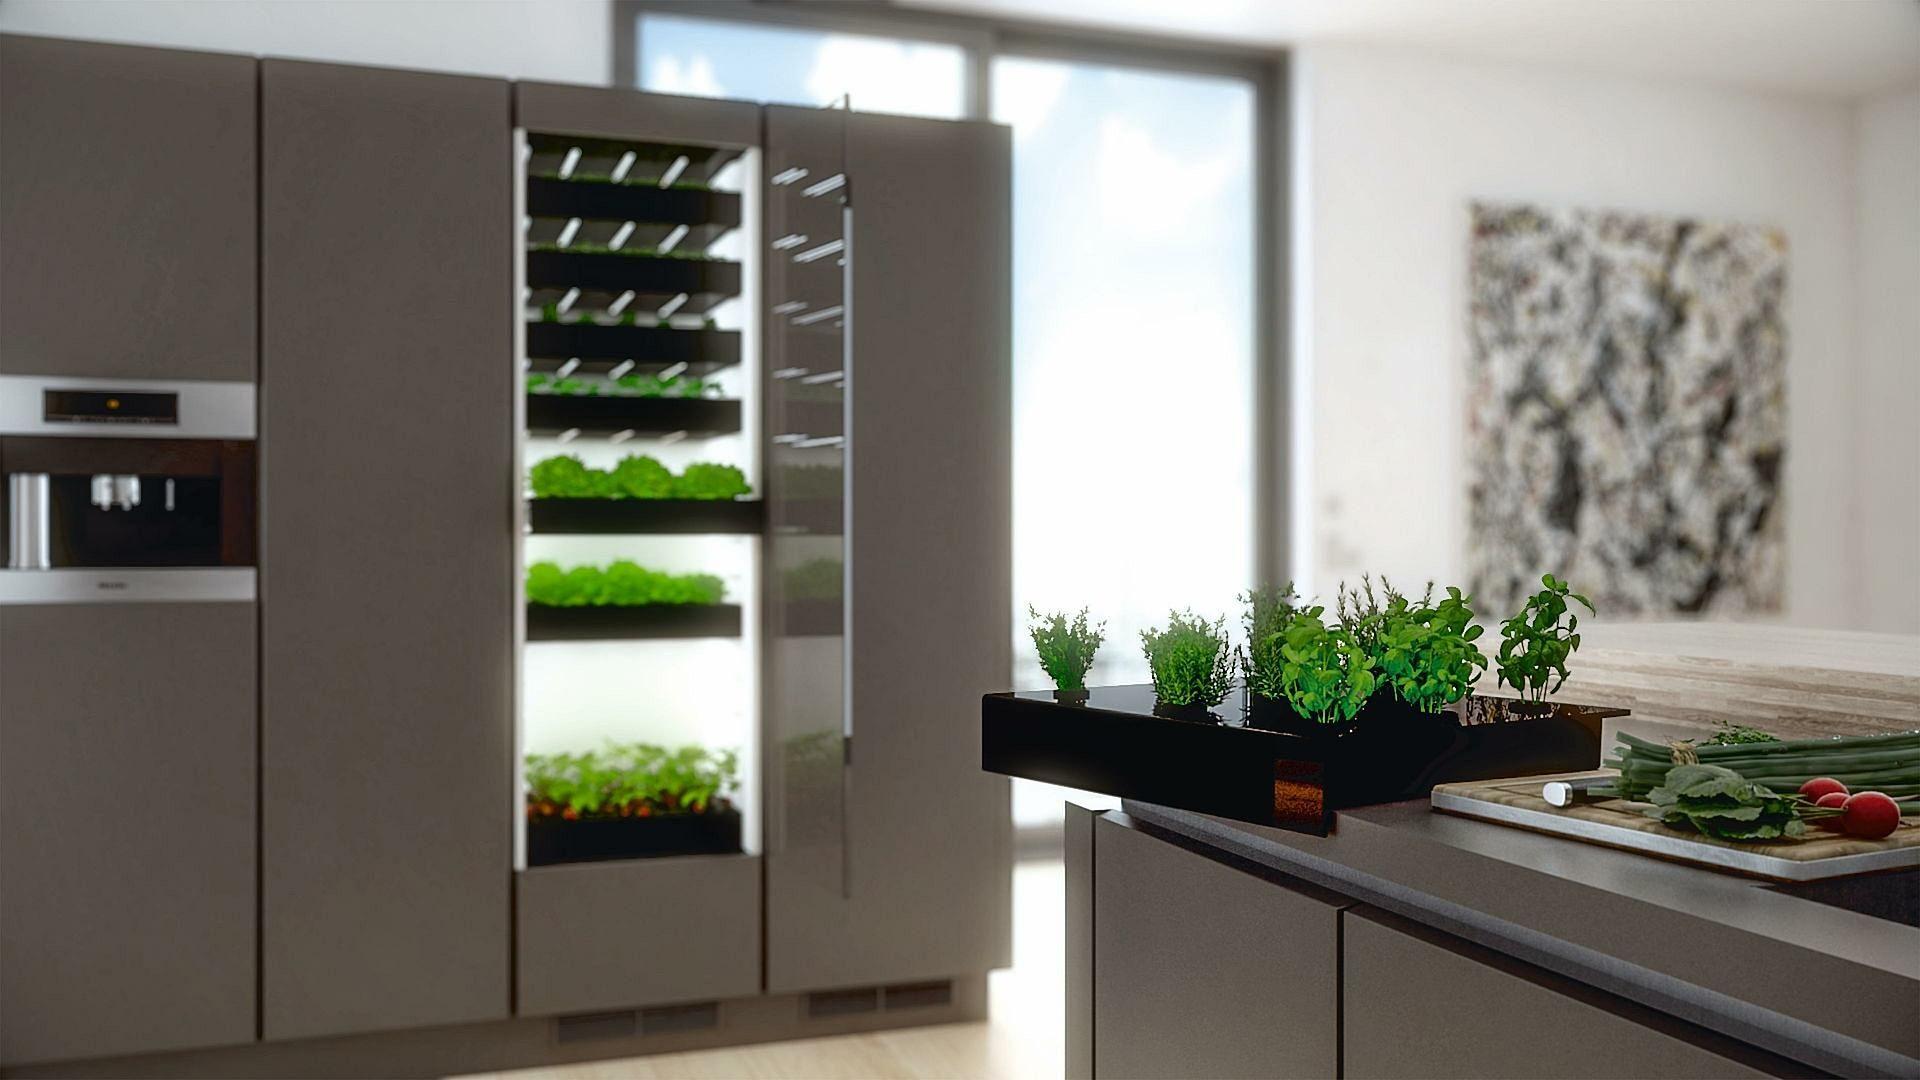 Kitchen Farming An Alternative To Your Usual Kitchen Bora Vertical Vegetable Gardens Farm Kitchen Manufacturers